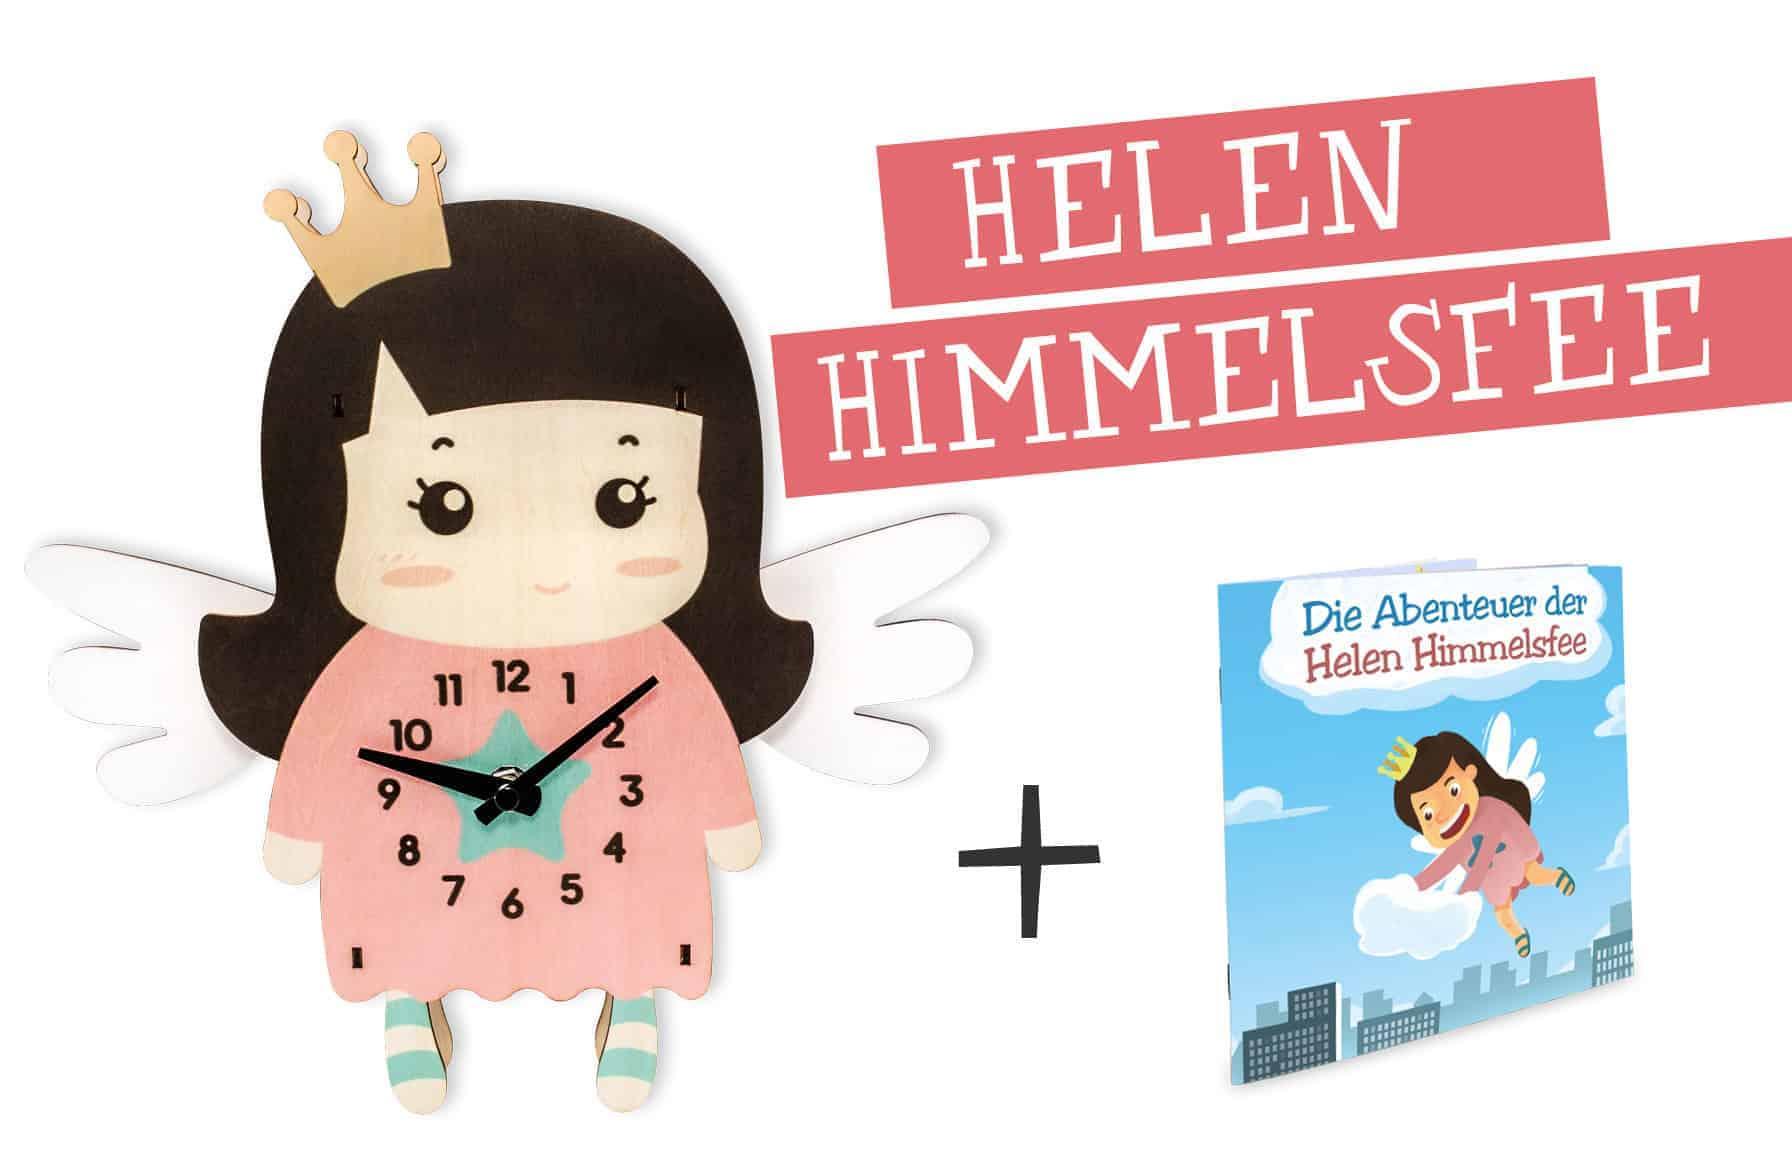 Glueckswolke Highlight - Helen Himmelsfee